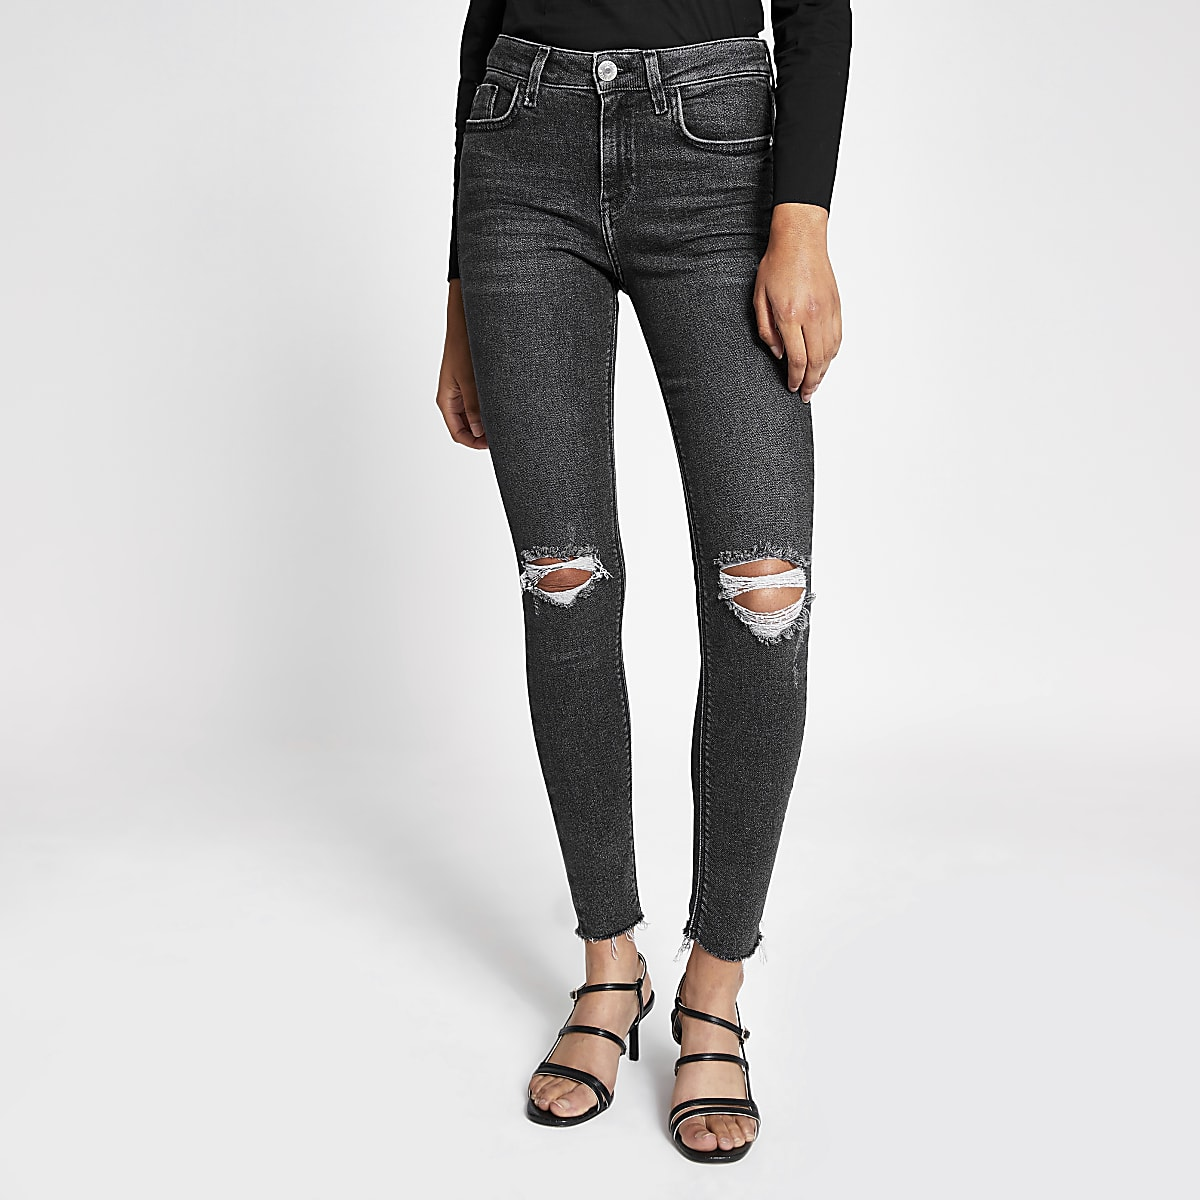 Amelie - Grijze superskinny ripped jeans